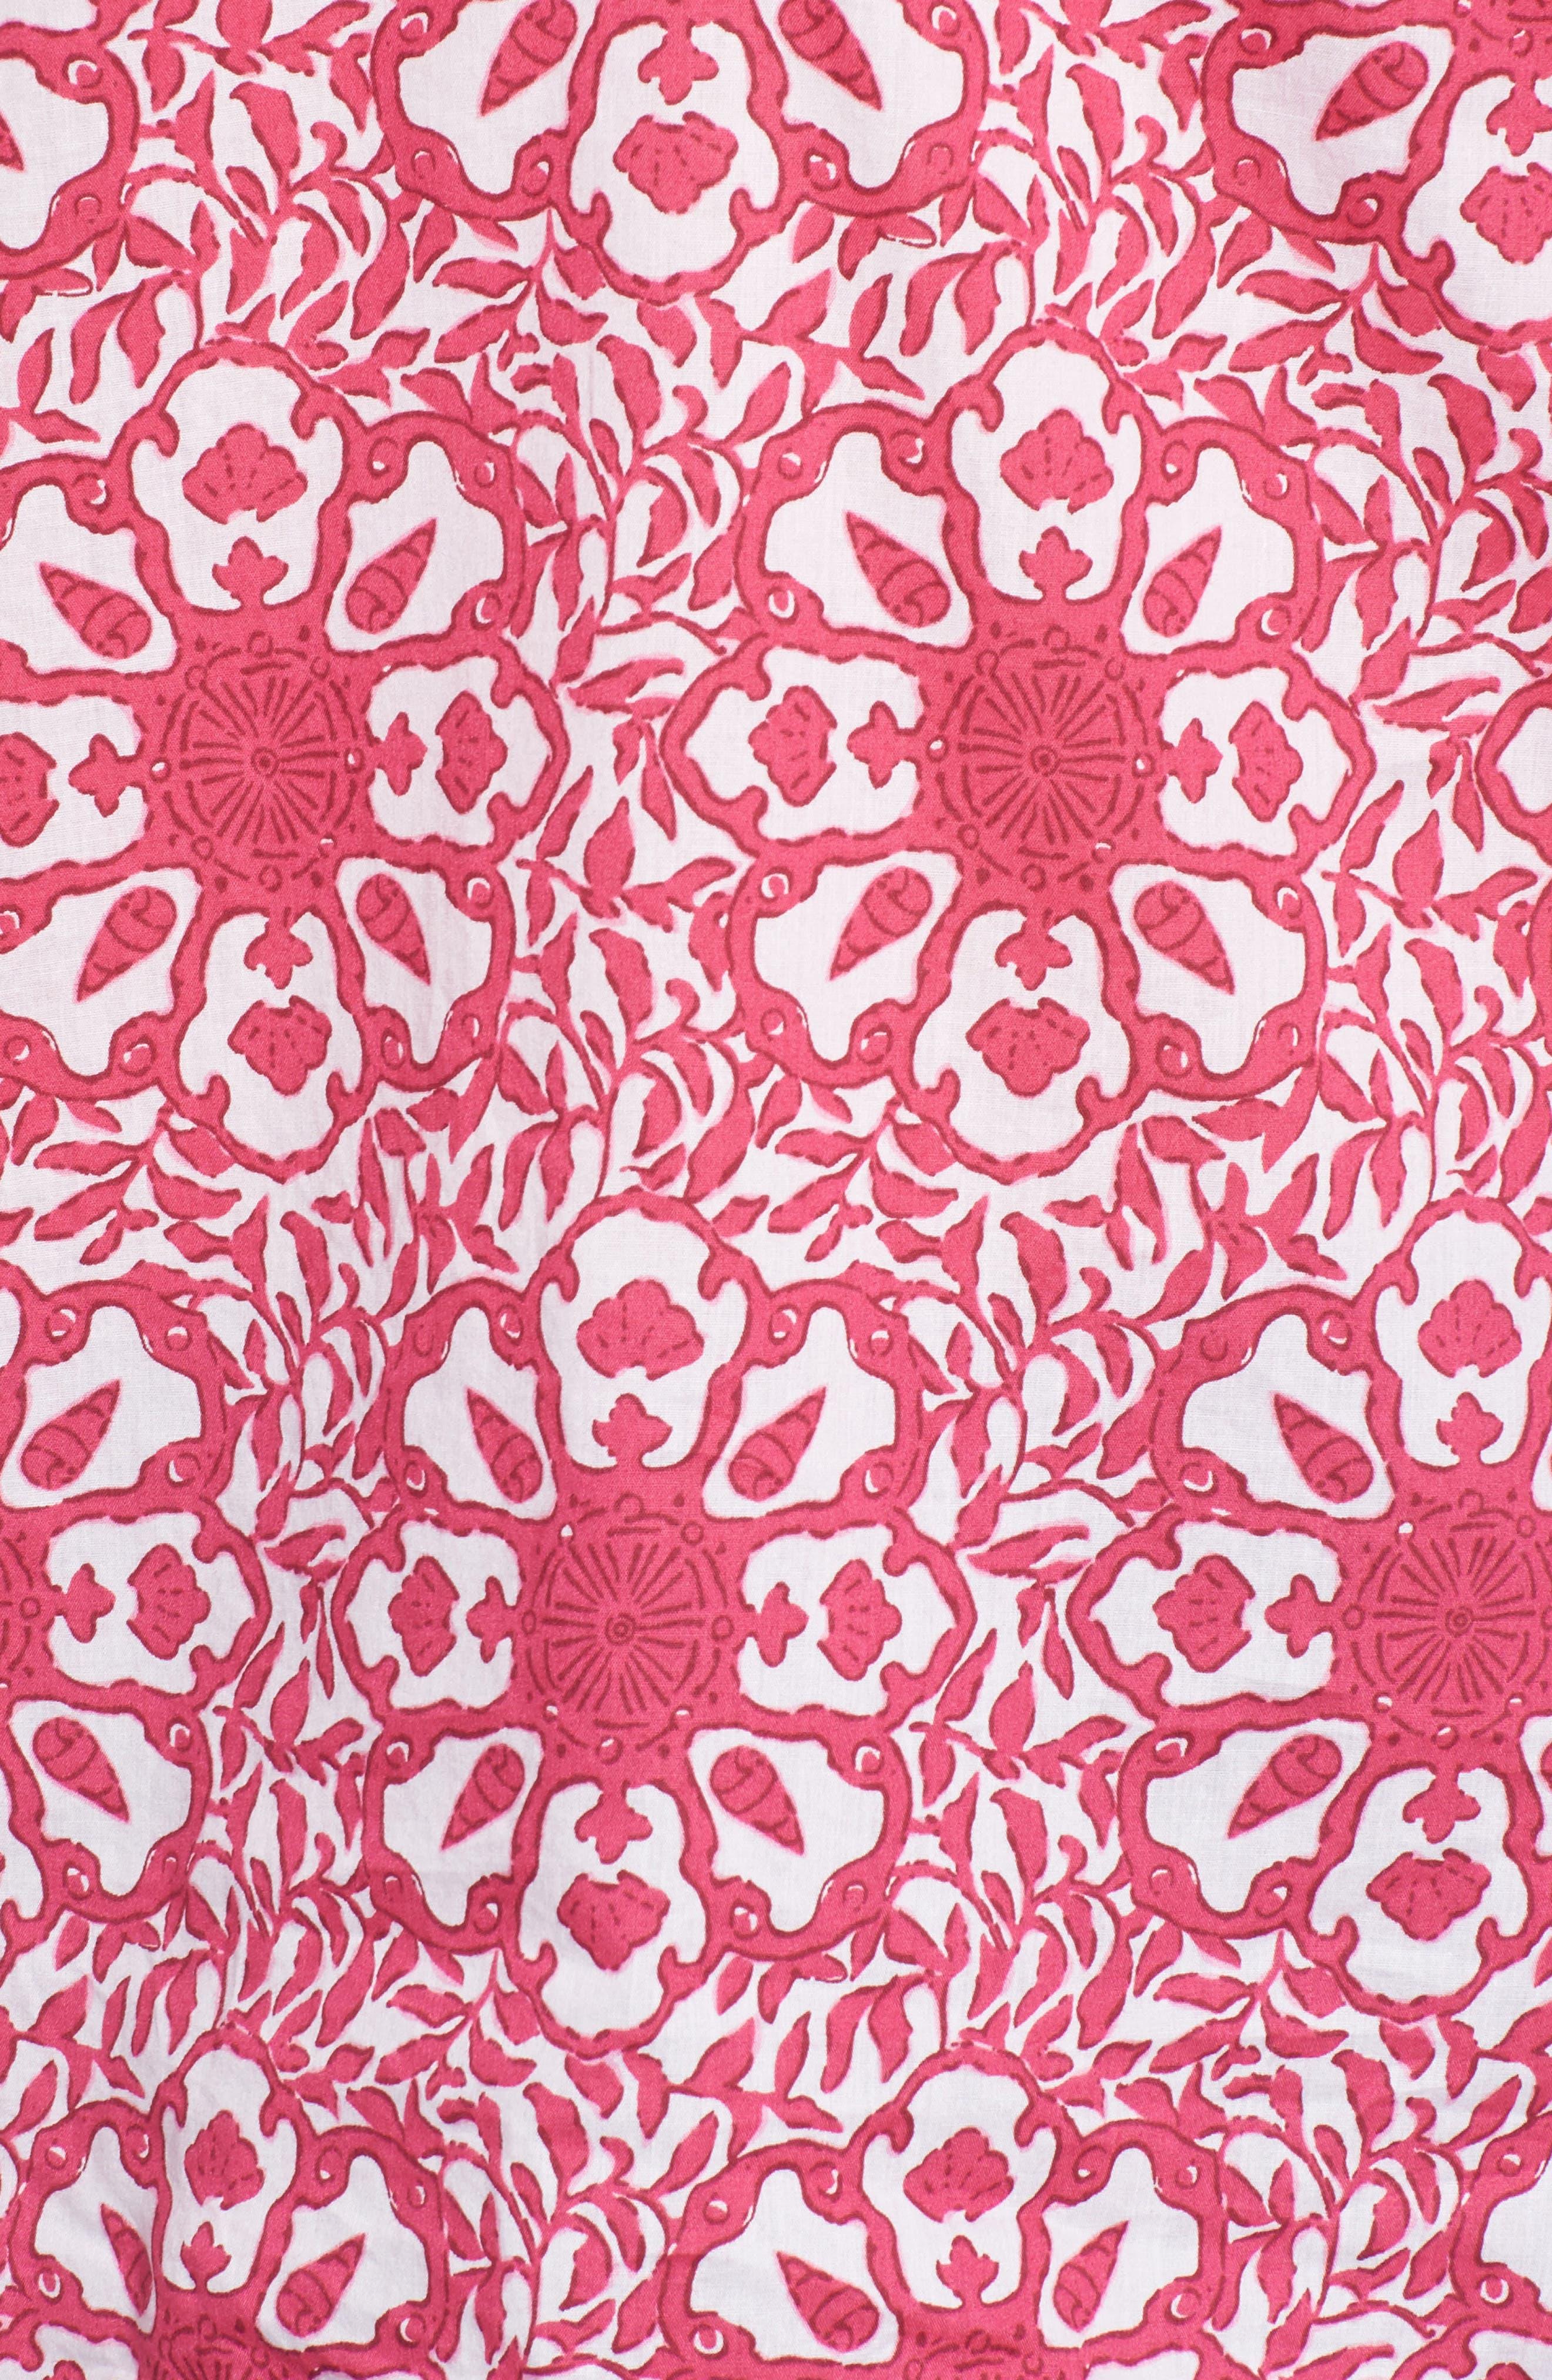 Tile Medallion Cotton Top,                             Alternate thumbnail 5, color,                             Rhododendron